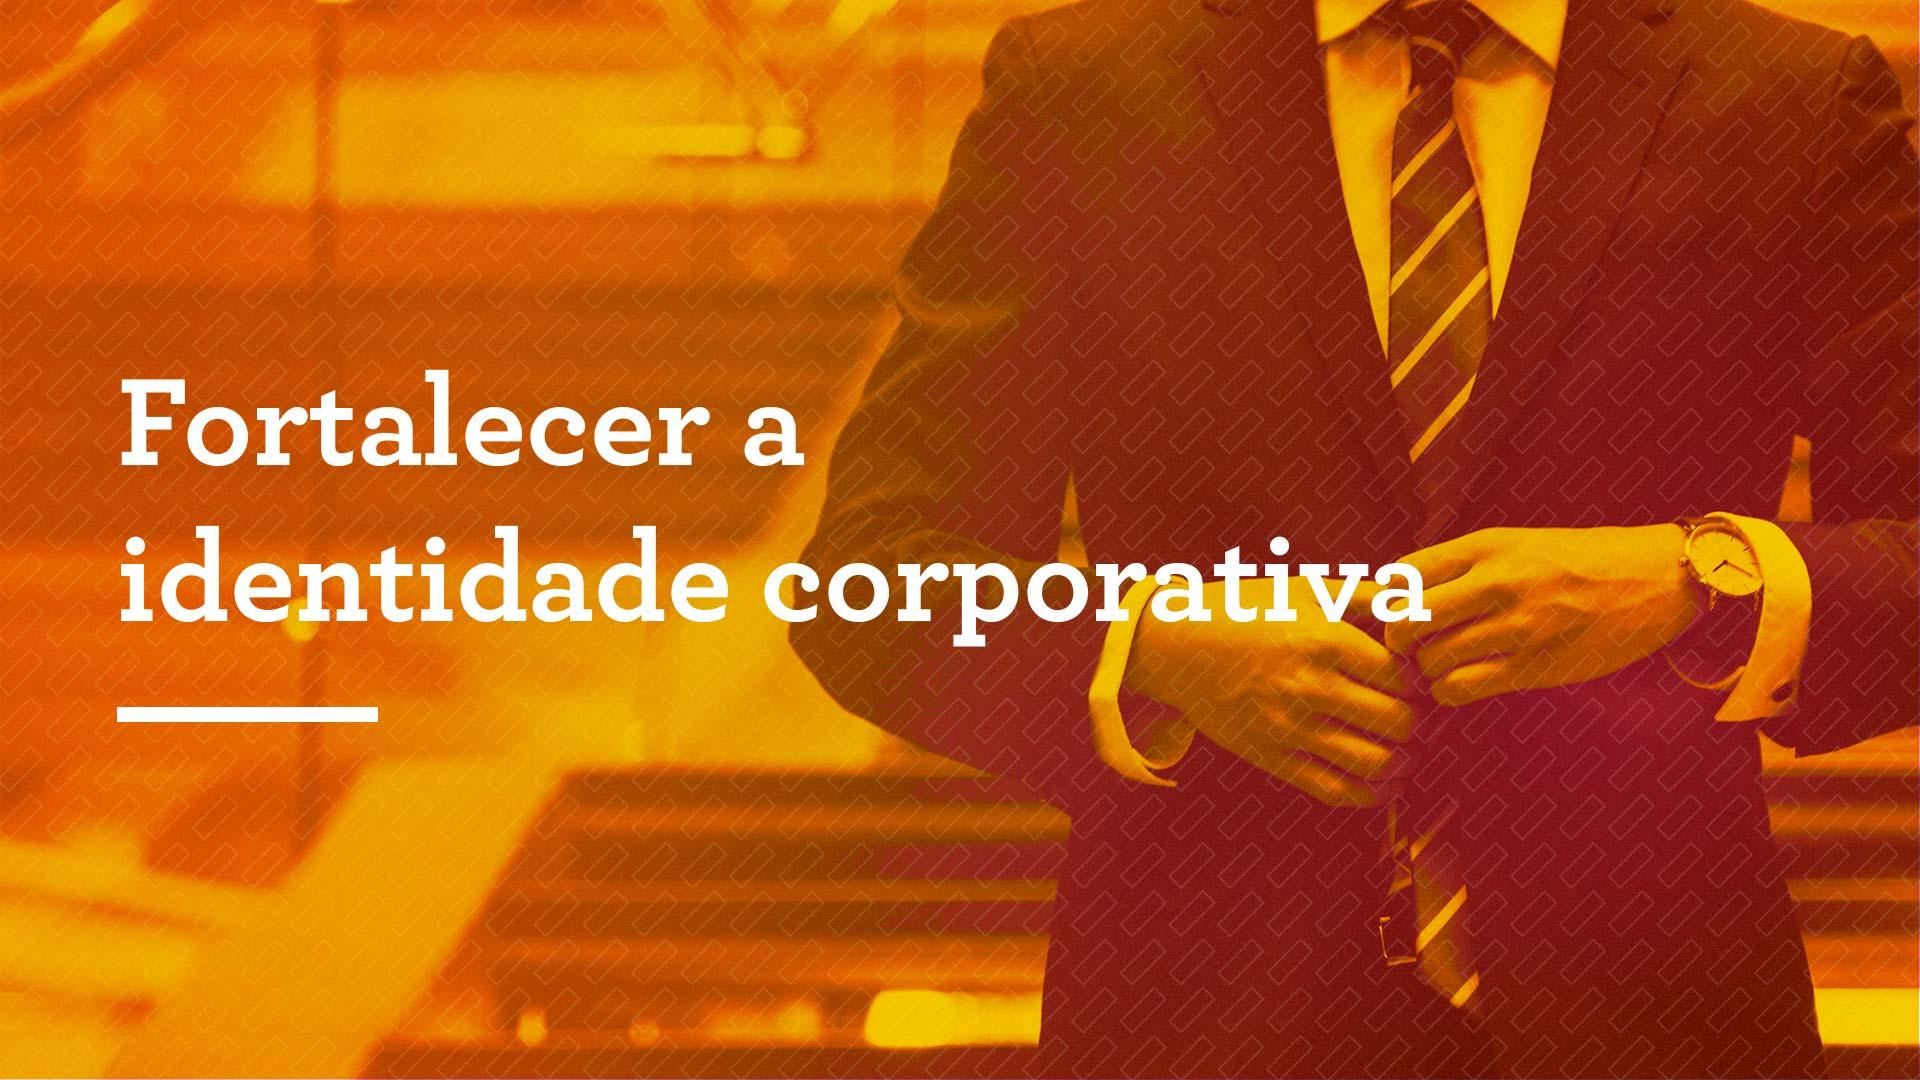 Fortalecer a identidade corporativa